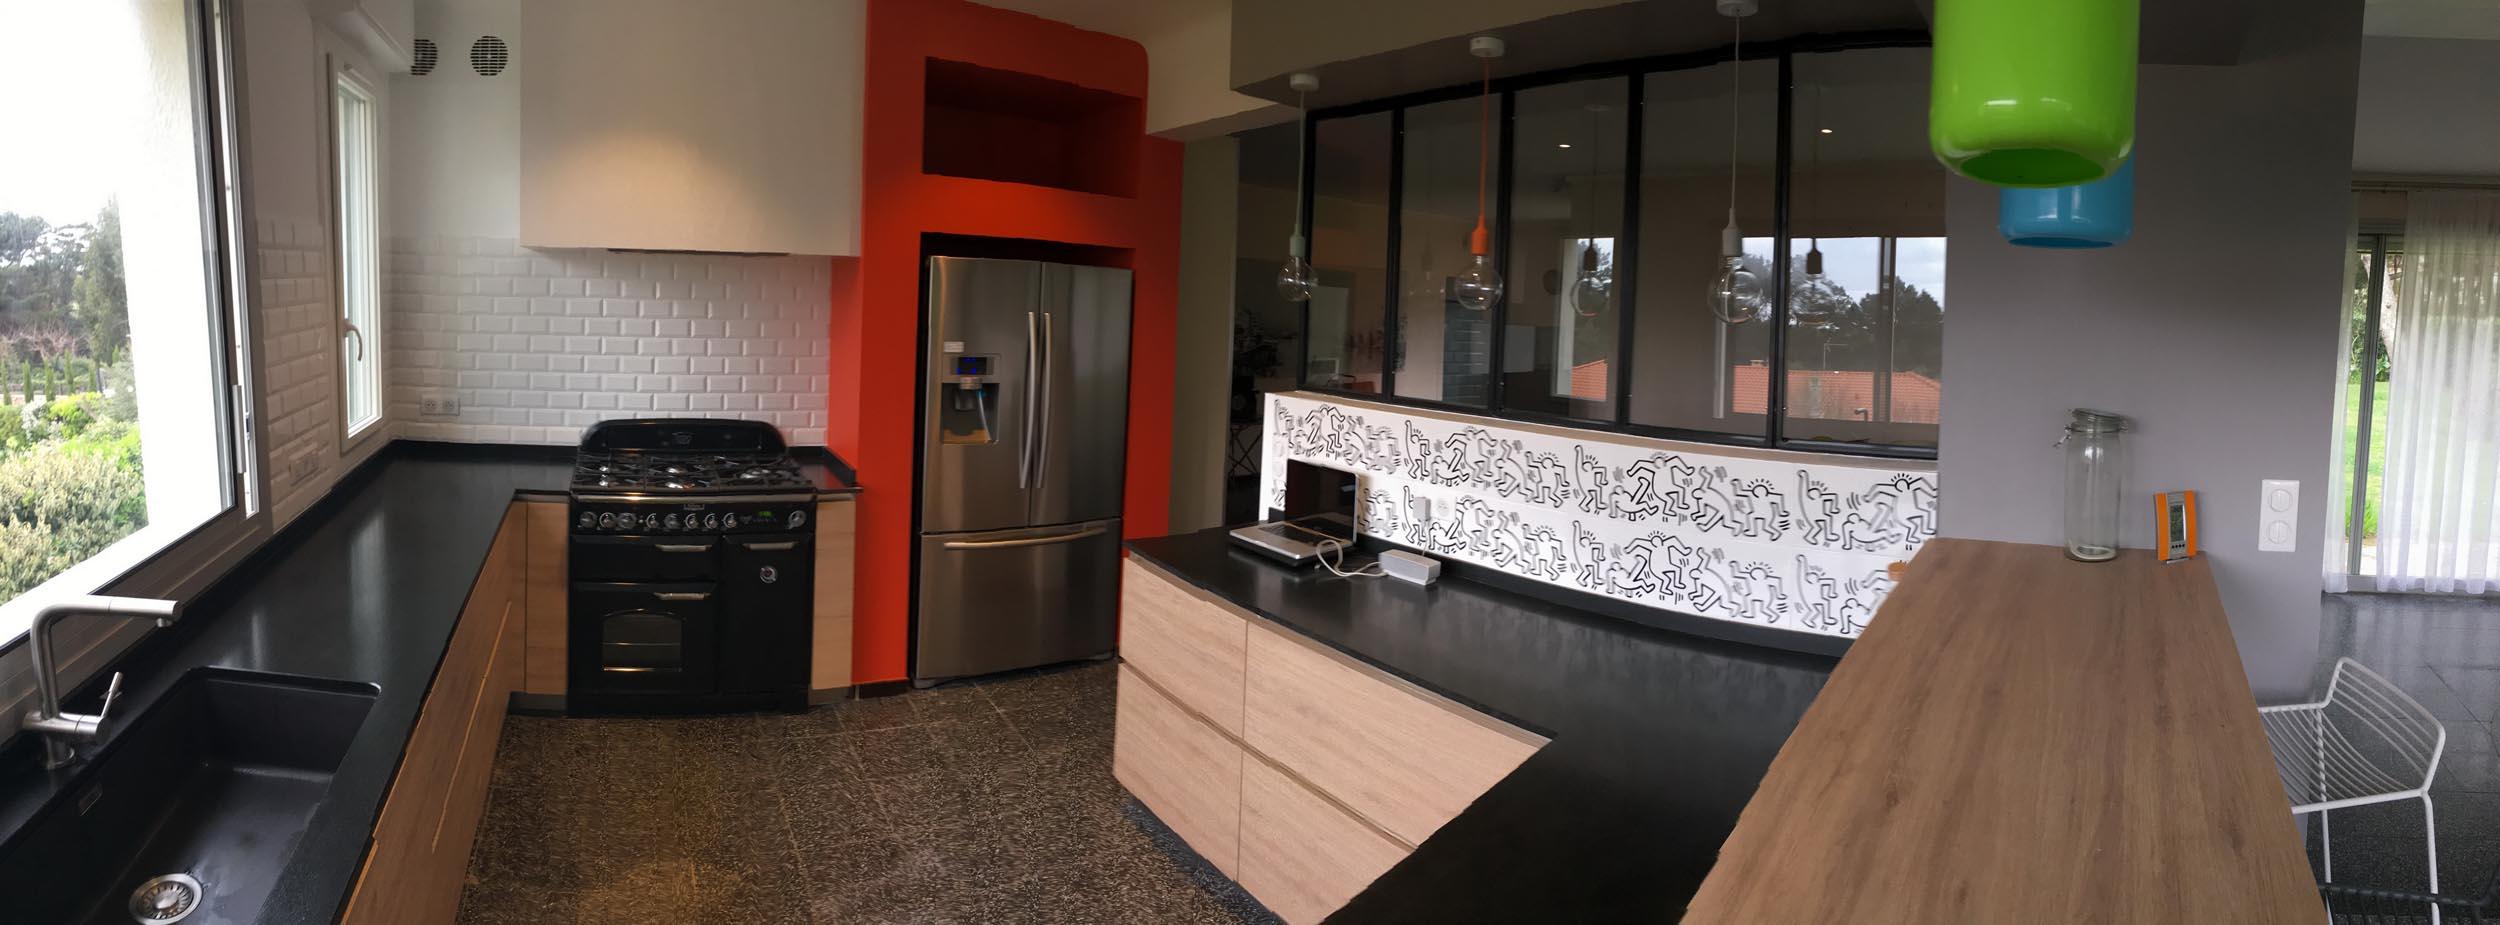 carolinemaccioni-decorationinterieur-renovationcuisine-maisonfamille-chiberta-anglet64-3353